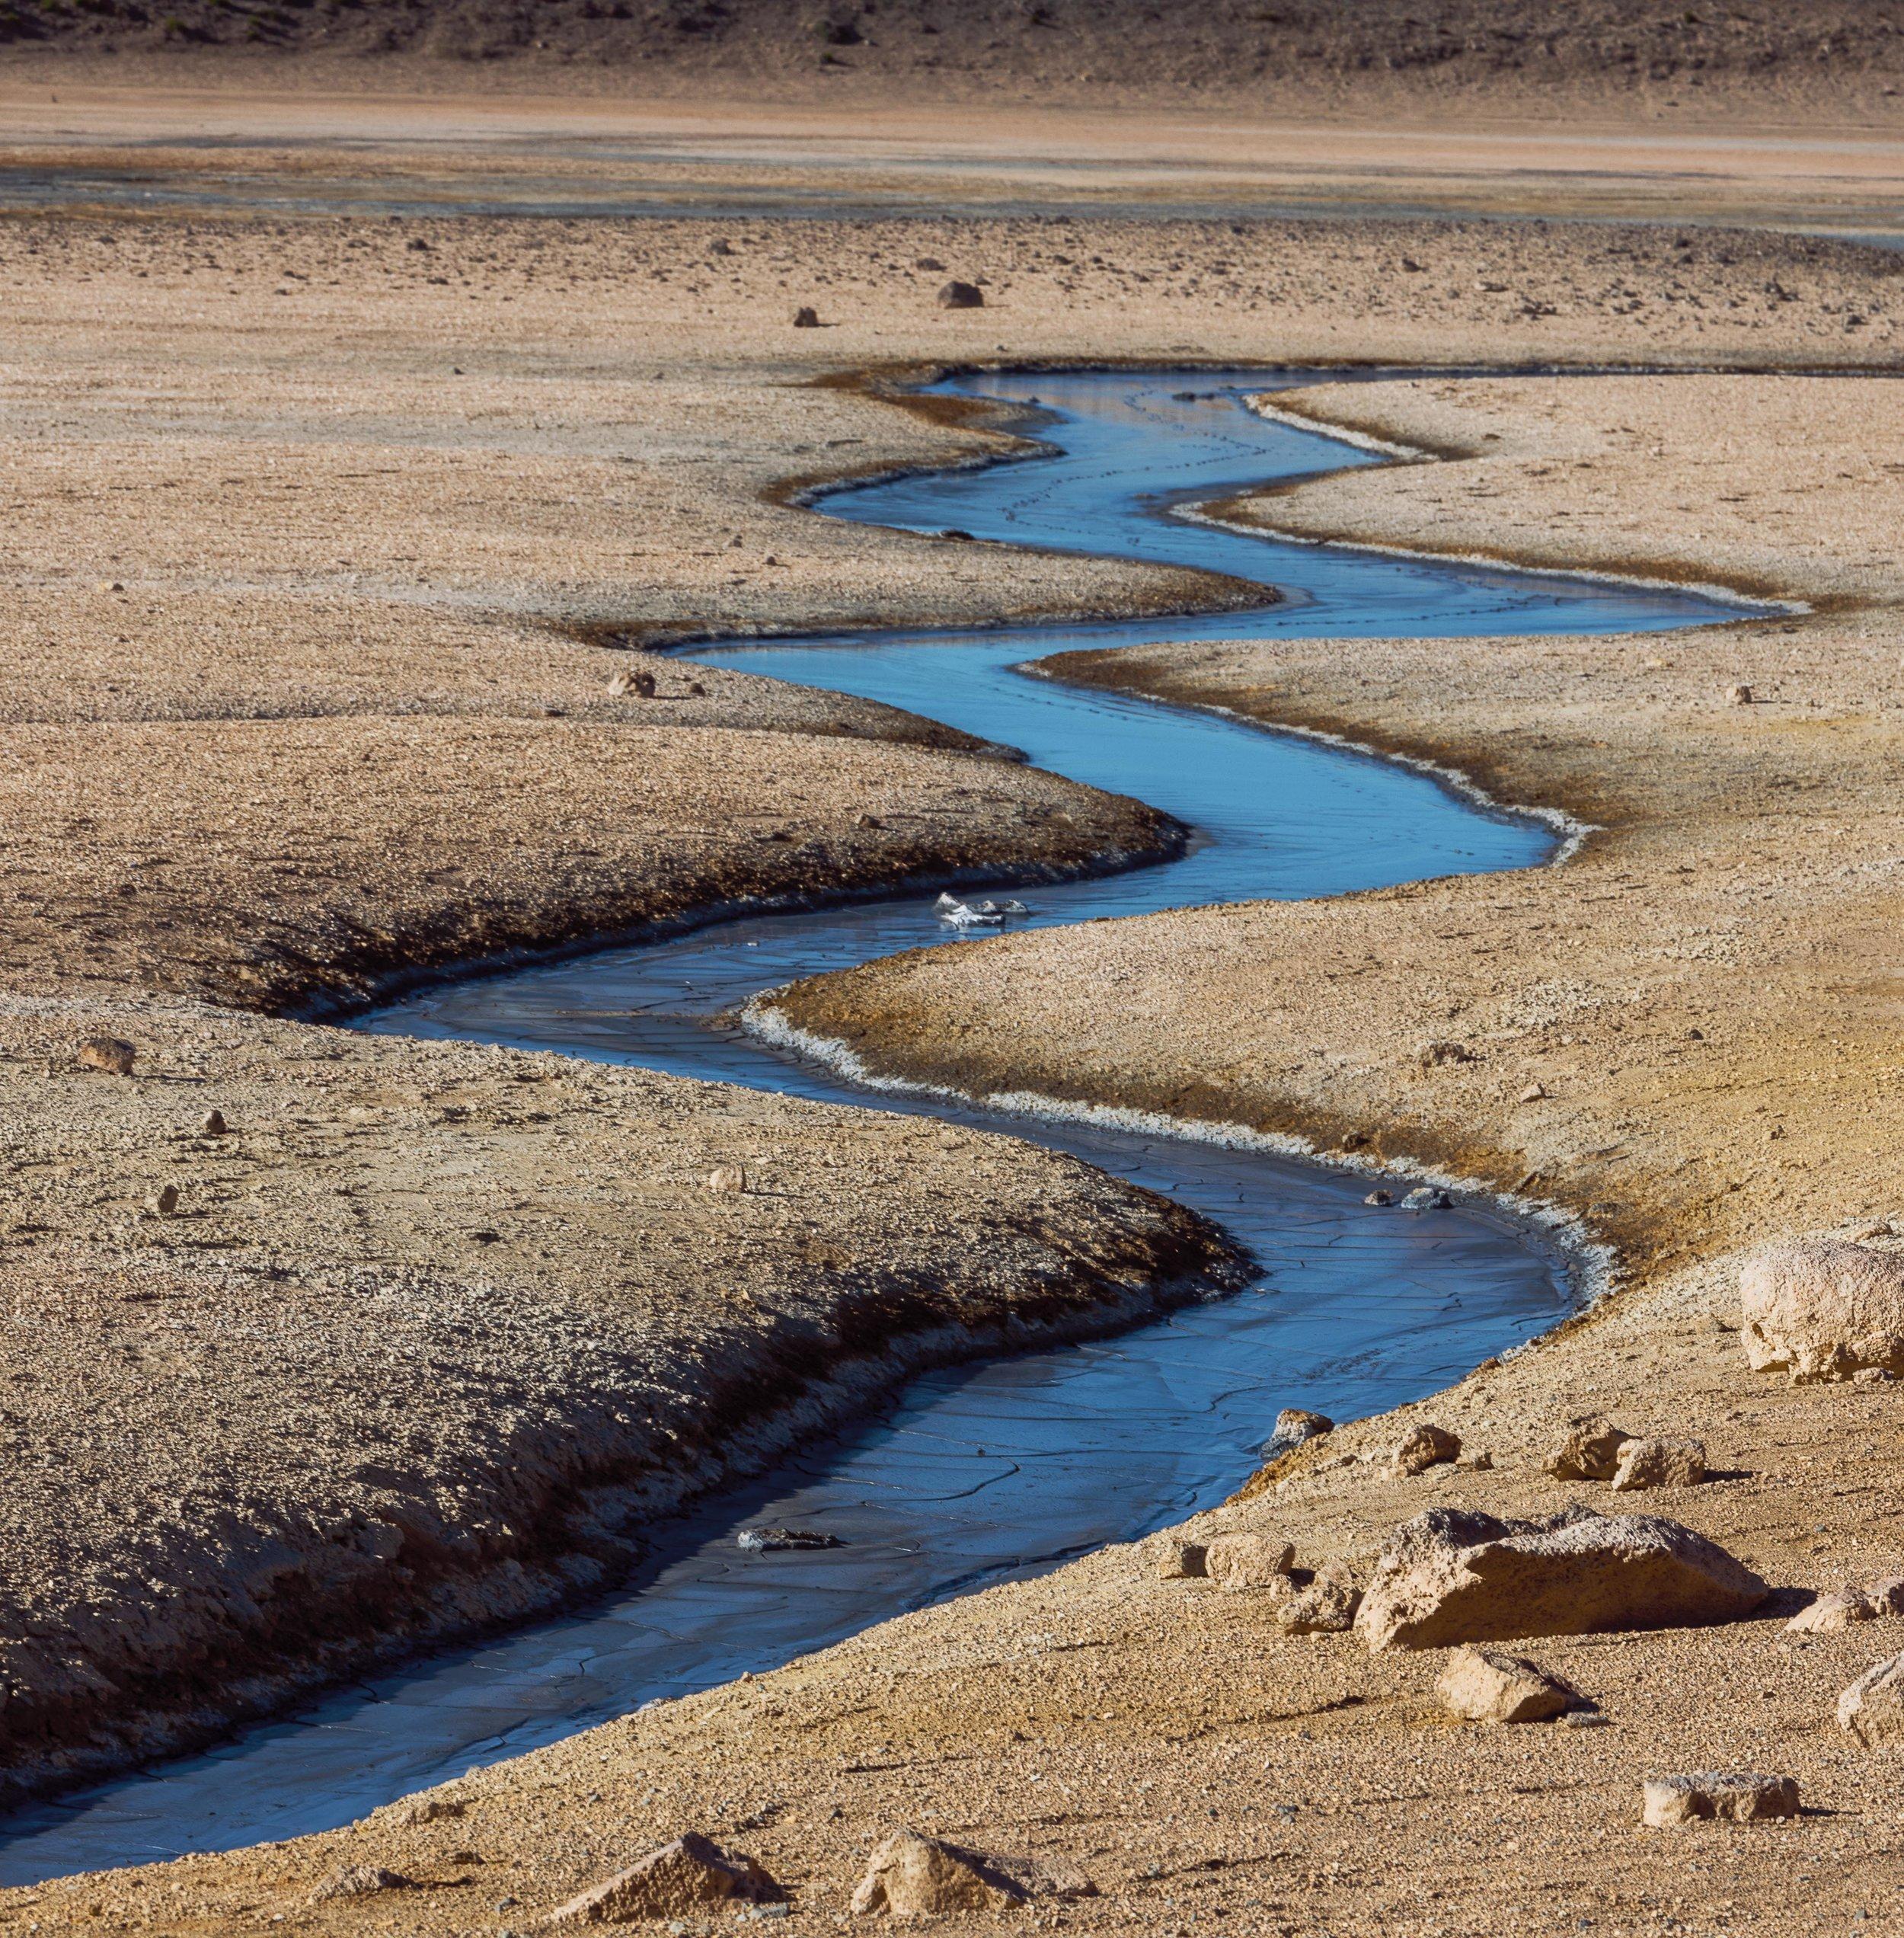 Curvy stream at Hverir Geothermal Park